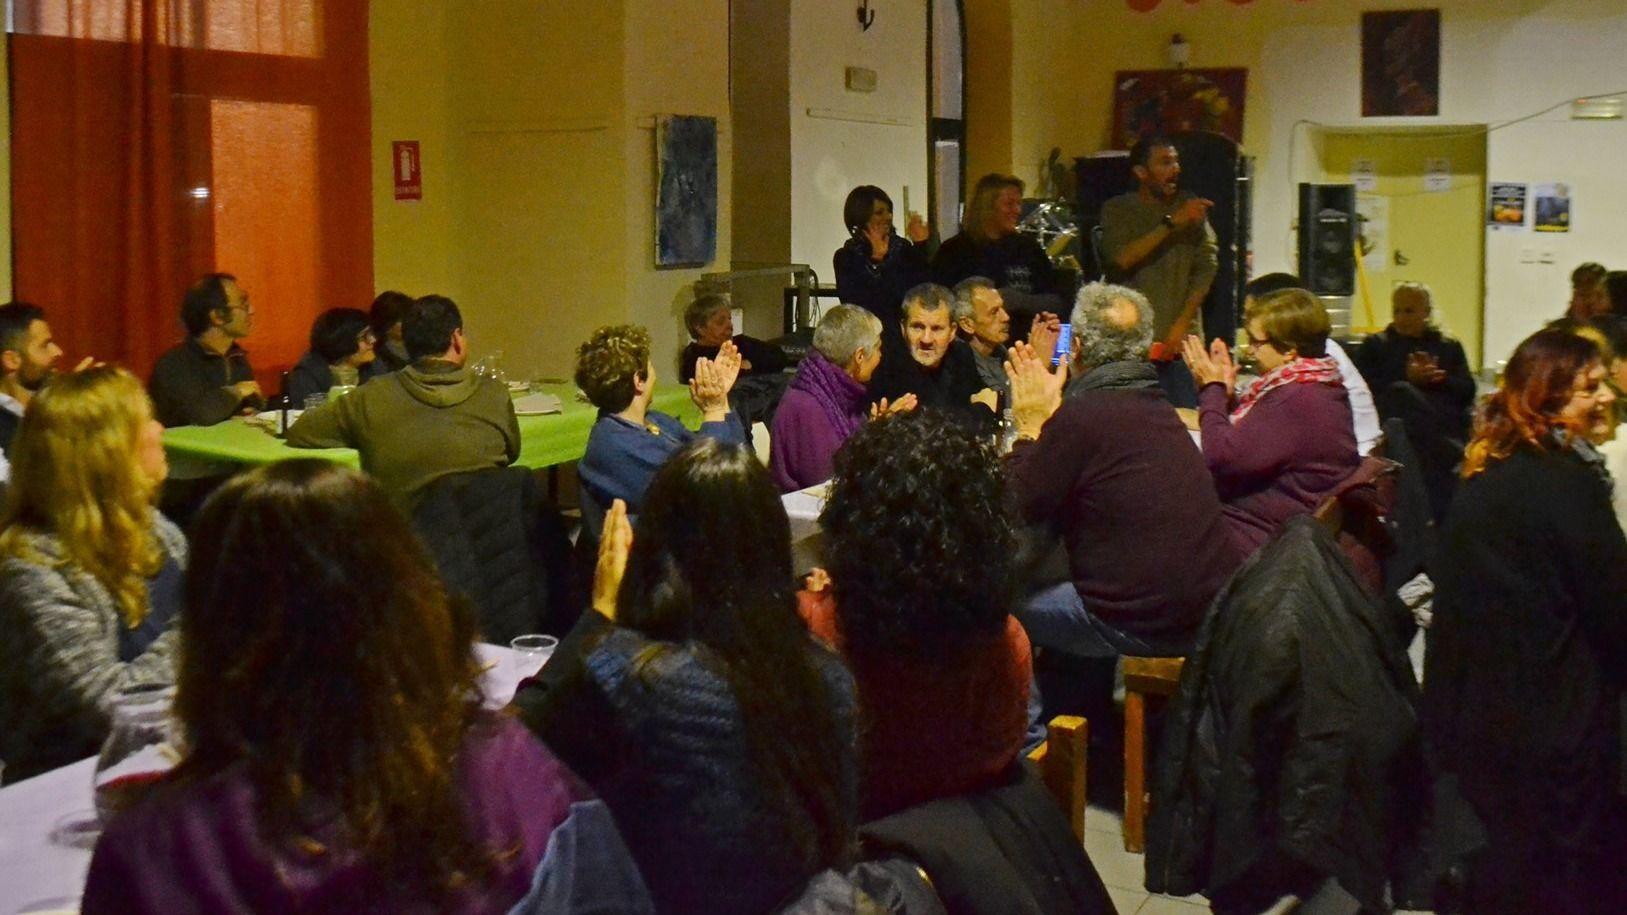 Incontri e Socialità - Meetings and Sociality Vegan Friendly